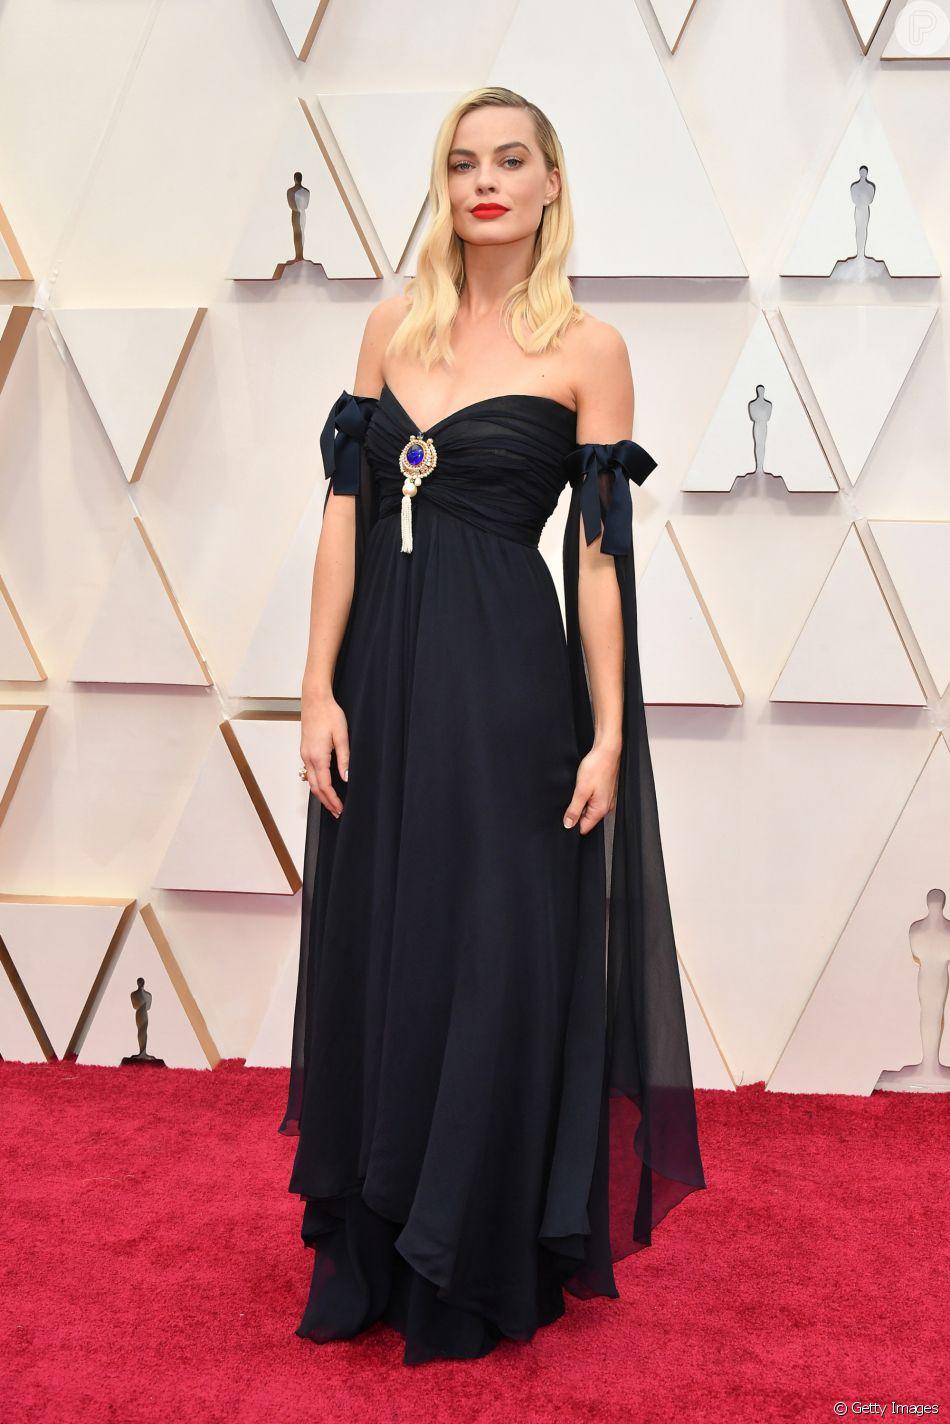 Margot Robbie de Chanel no Oscar 2020